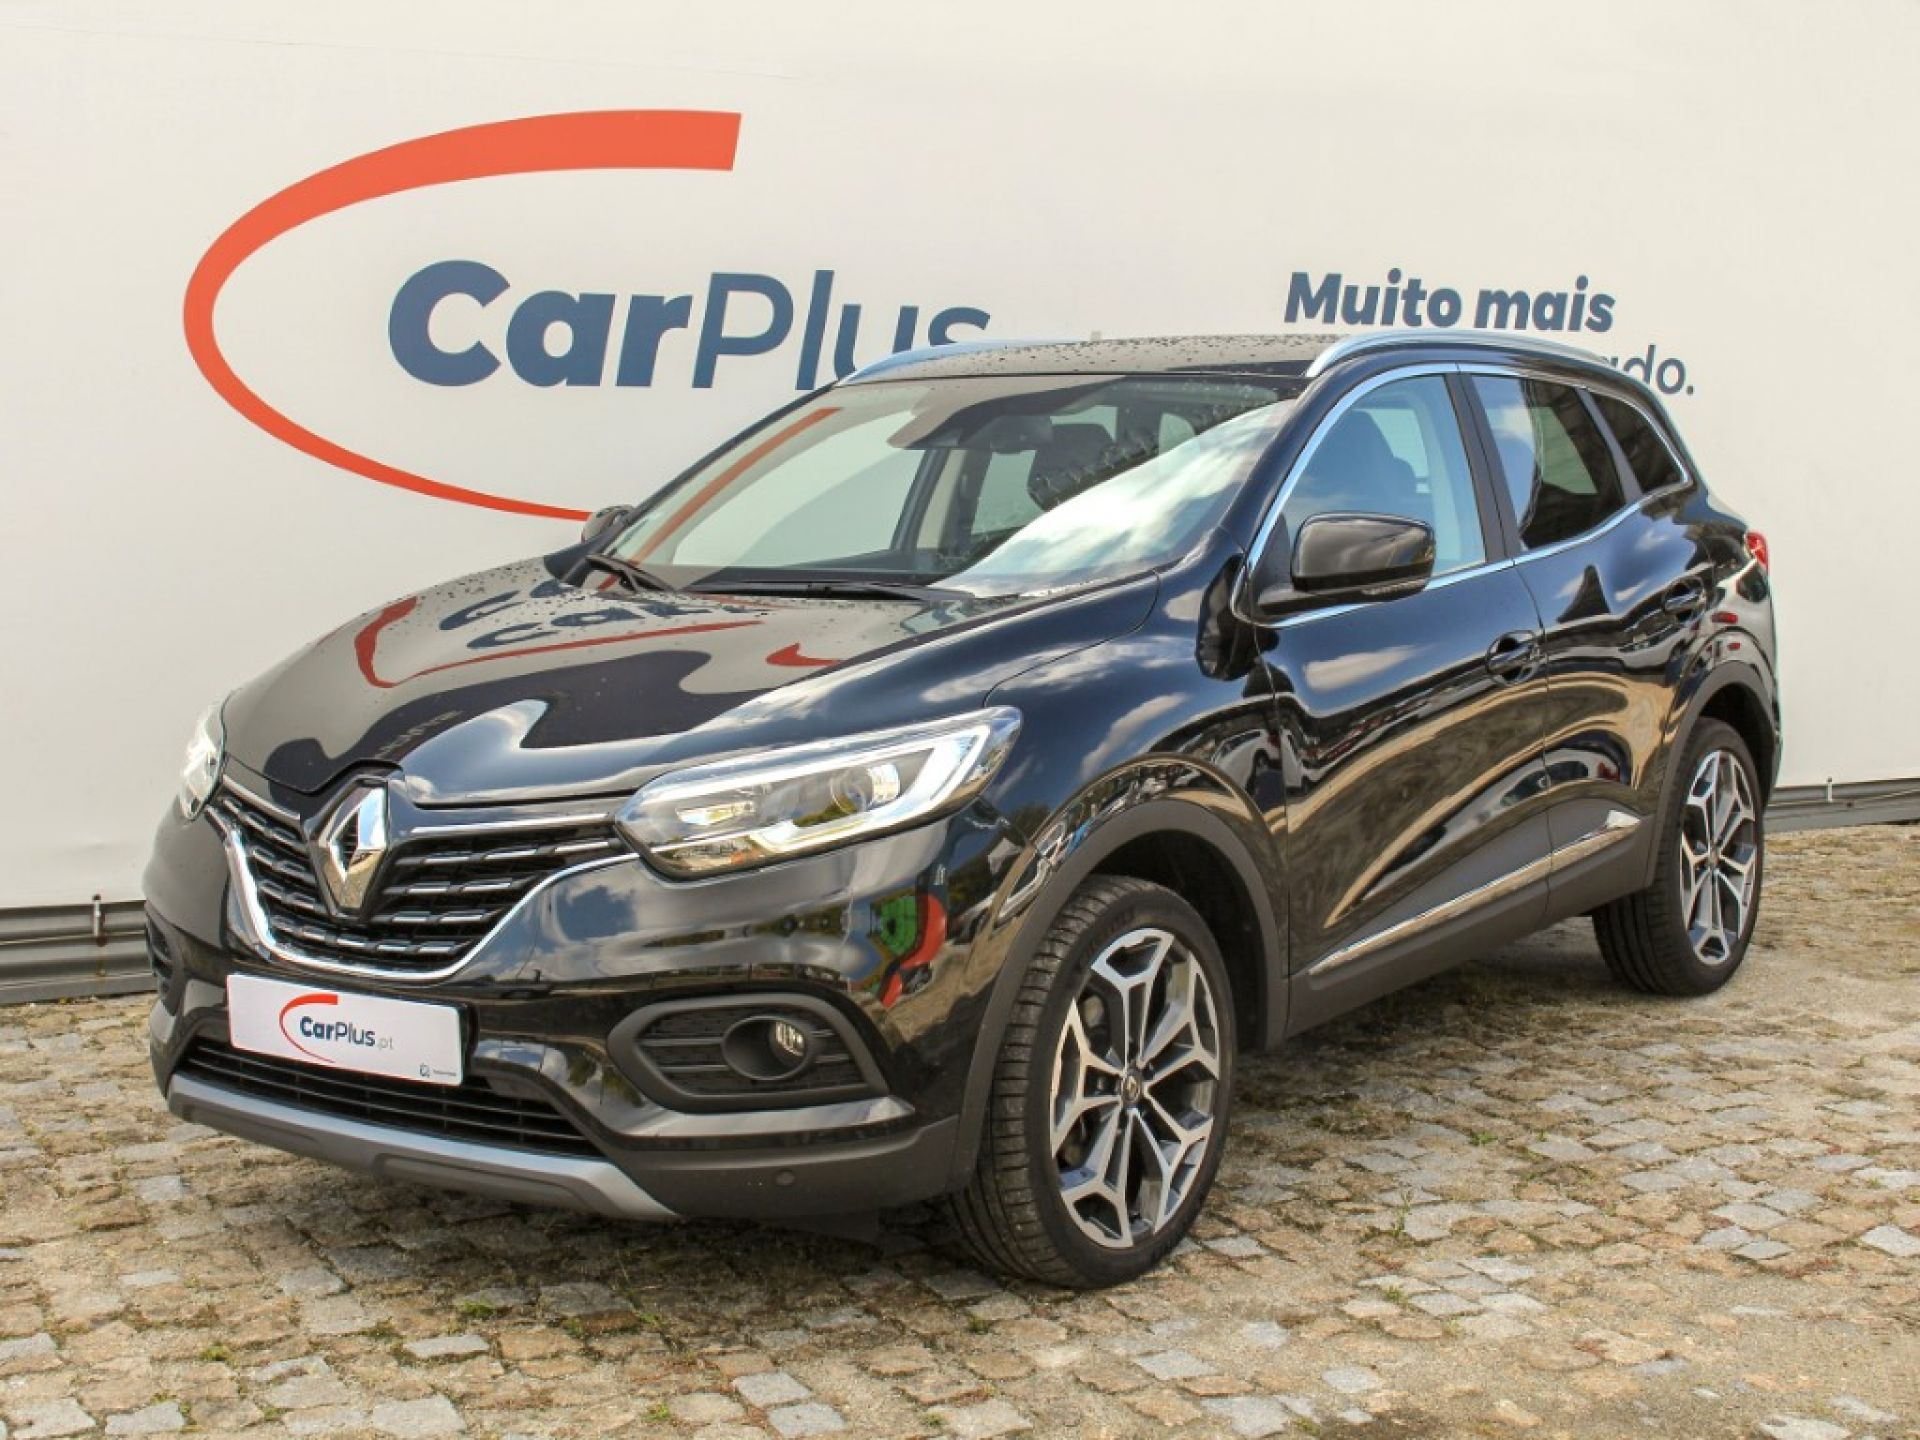 Renault Kadjar 1.3 TCe 140 FAP Intens segunda mão Braga